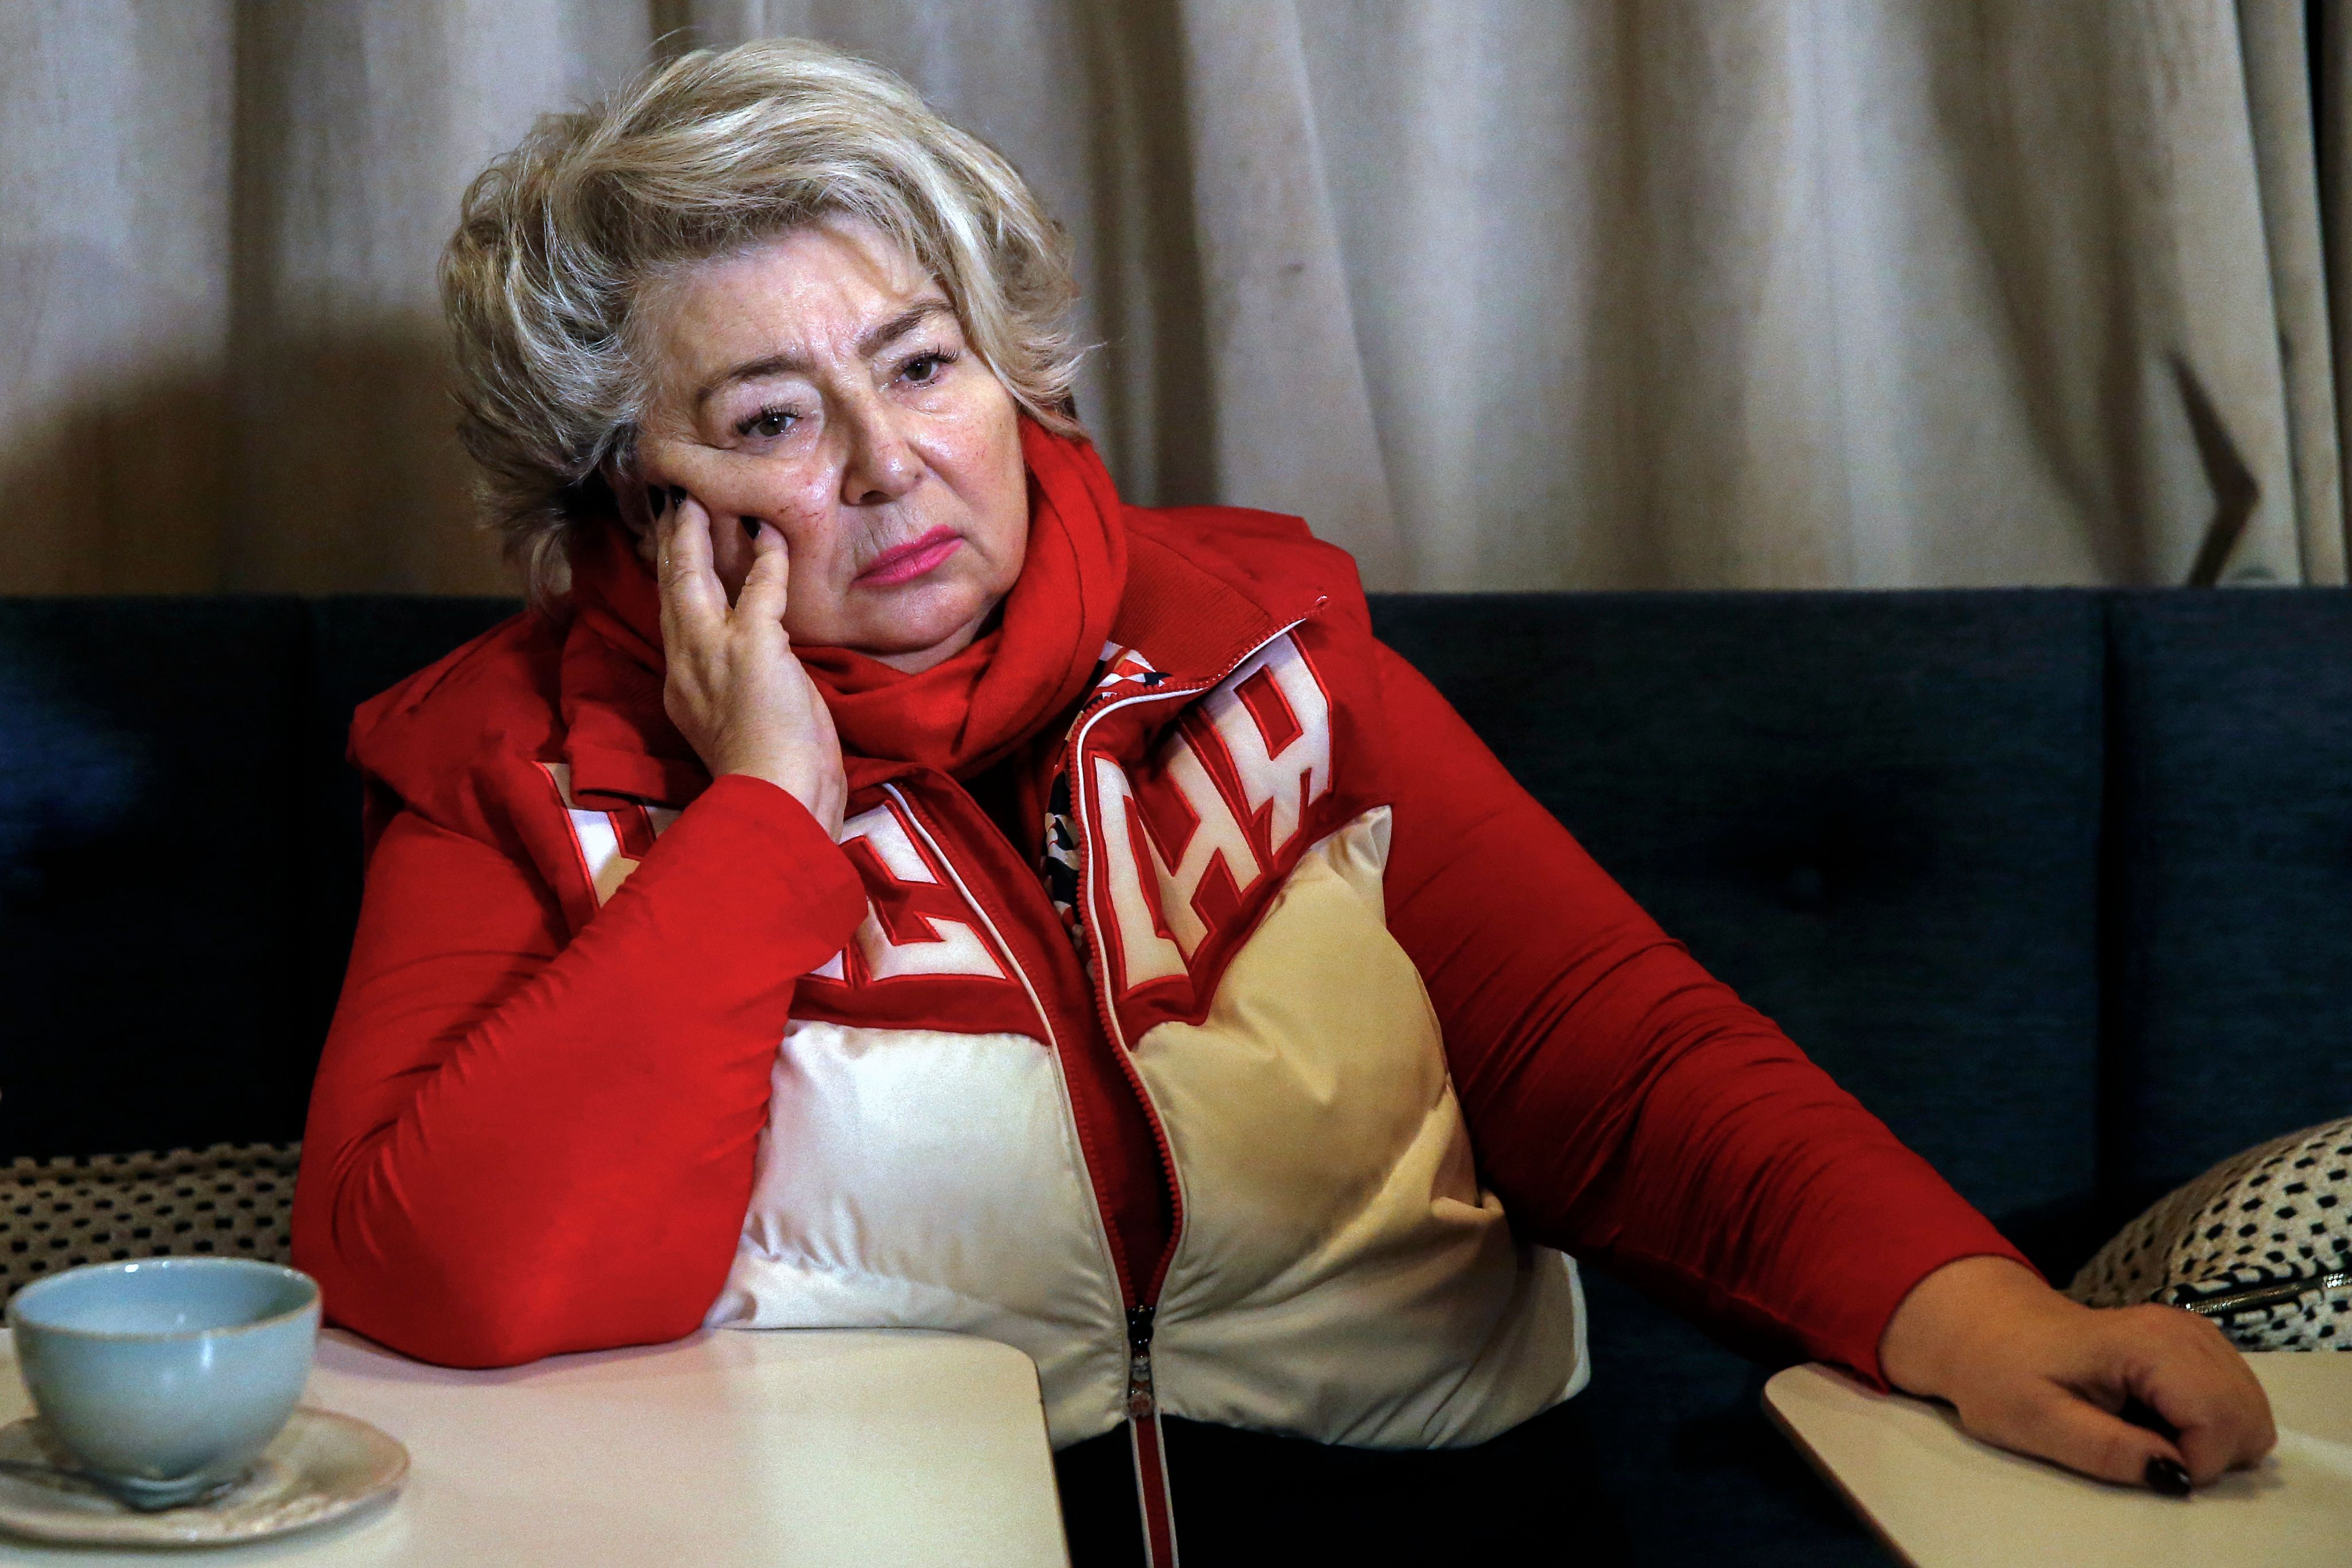 RUSSIA-OLY-2018-IOC-RUS-DOPING